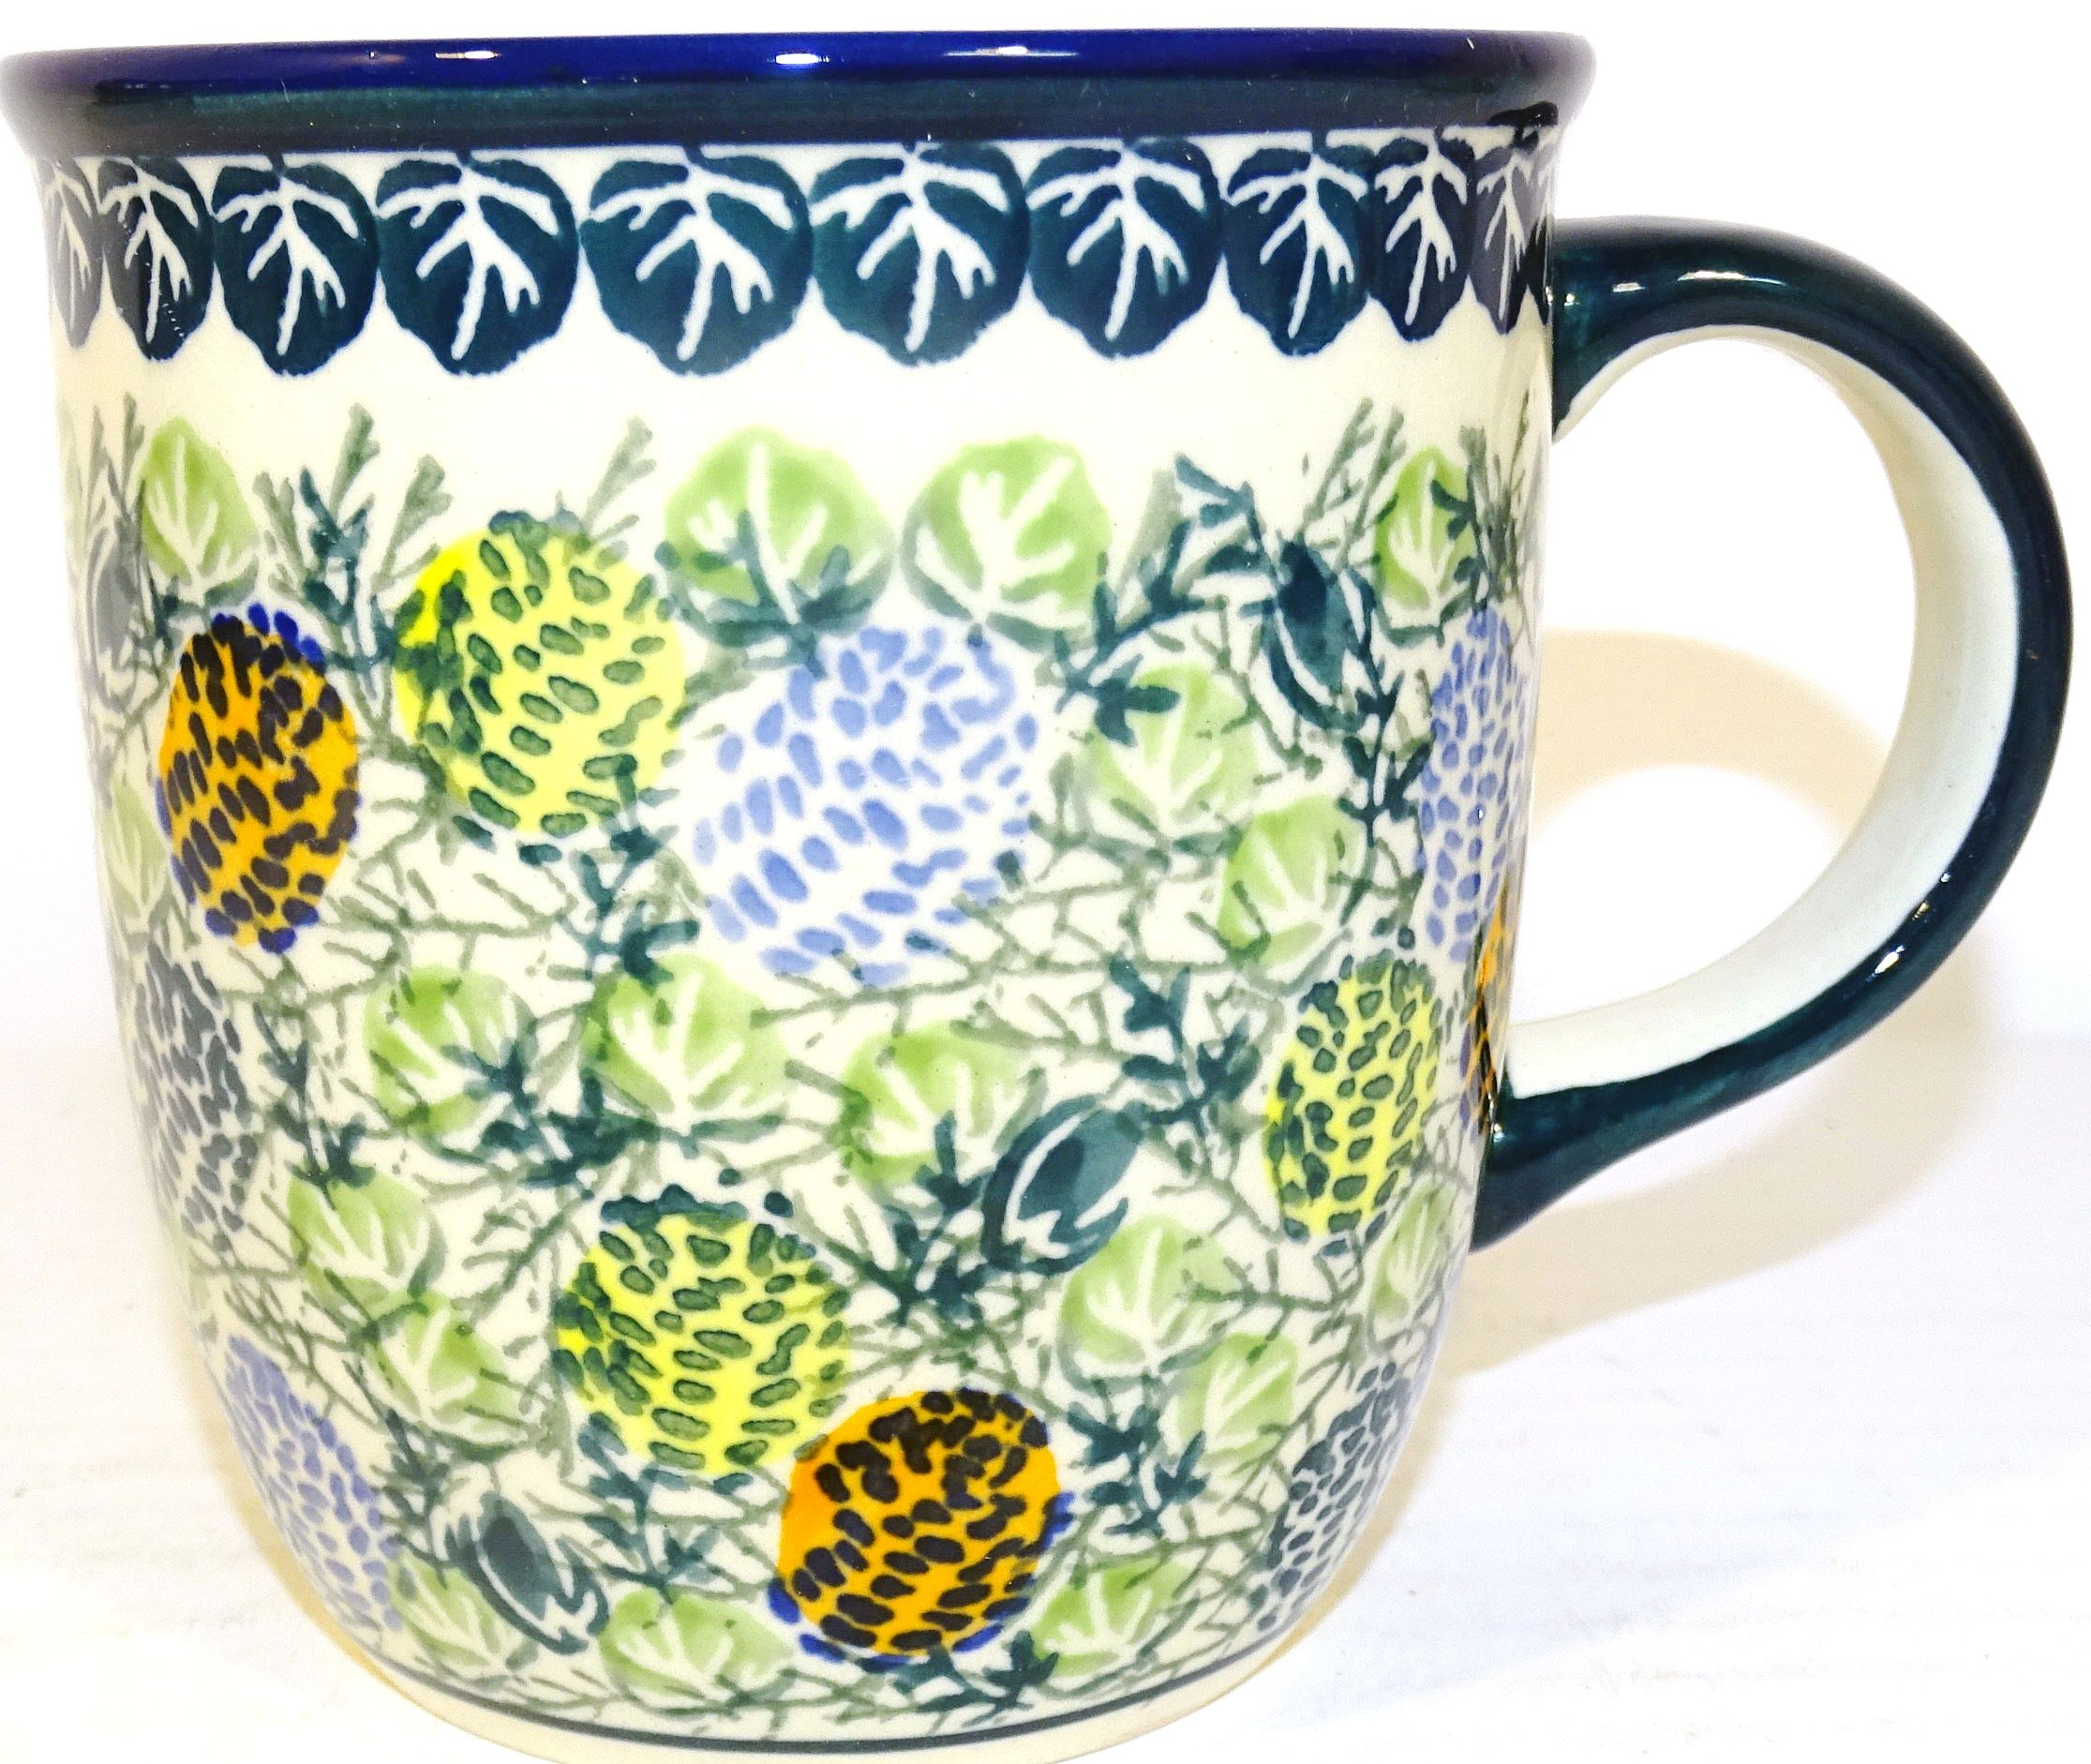 Pottery Avenue 12-oz PINECONE Stoneware Coffee Mug   ARTISAN